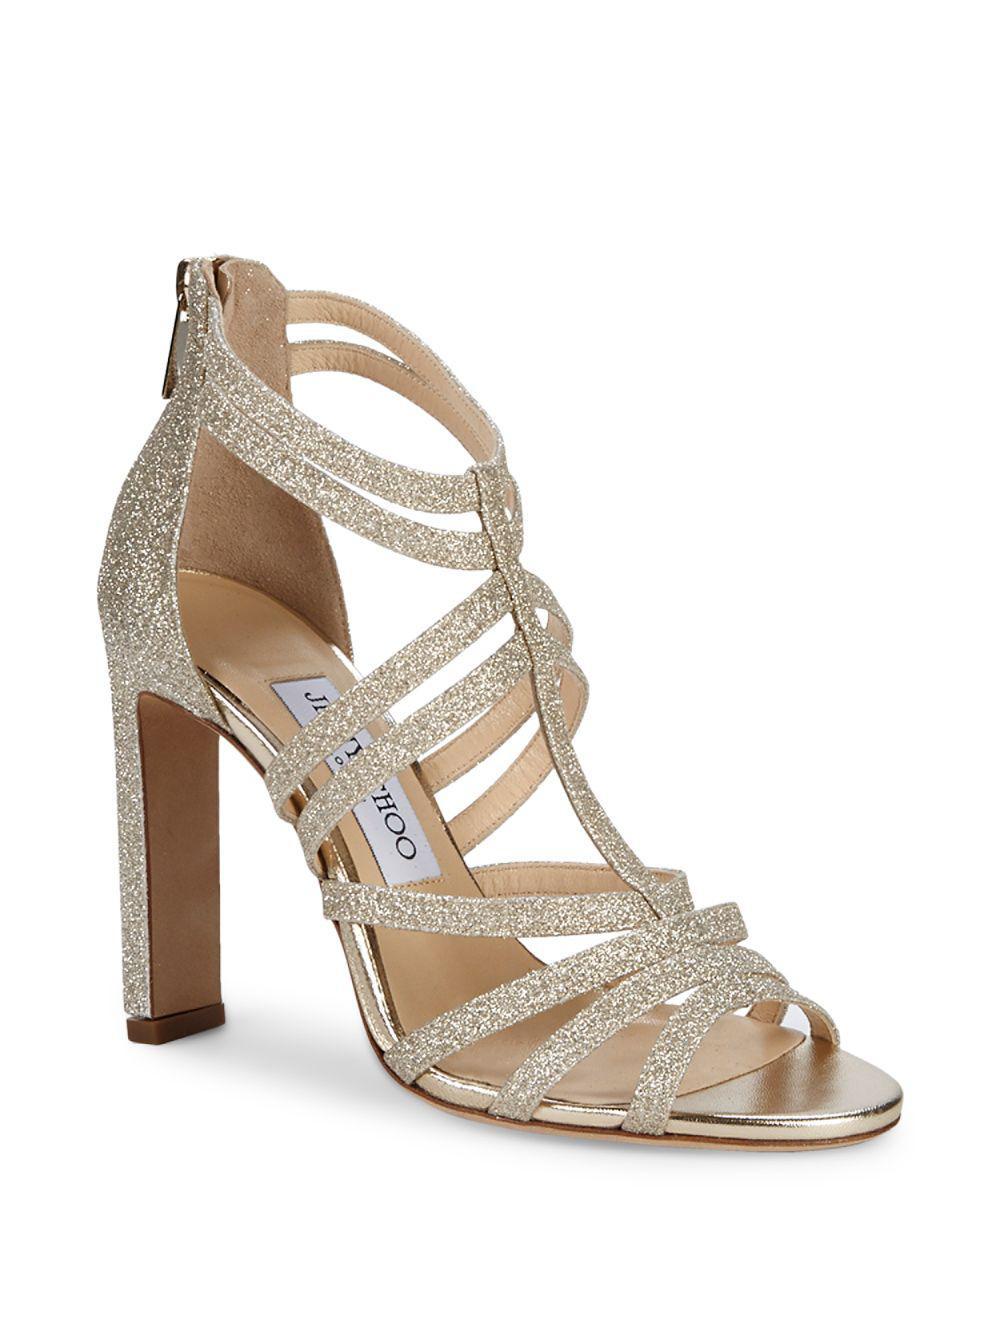 b30eac21de2 Lyst - Jimmy Choo Selina Glittered Strappy Sandals in Metallic